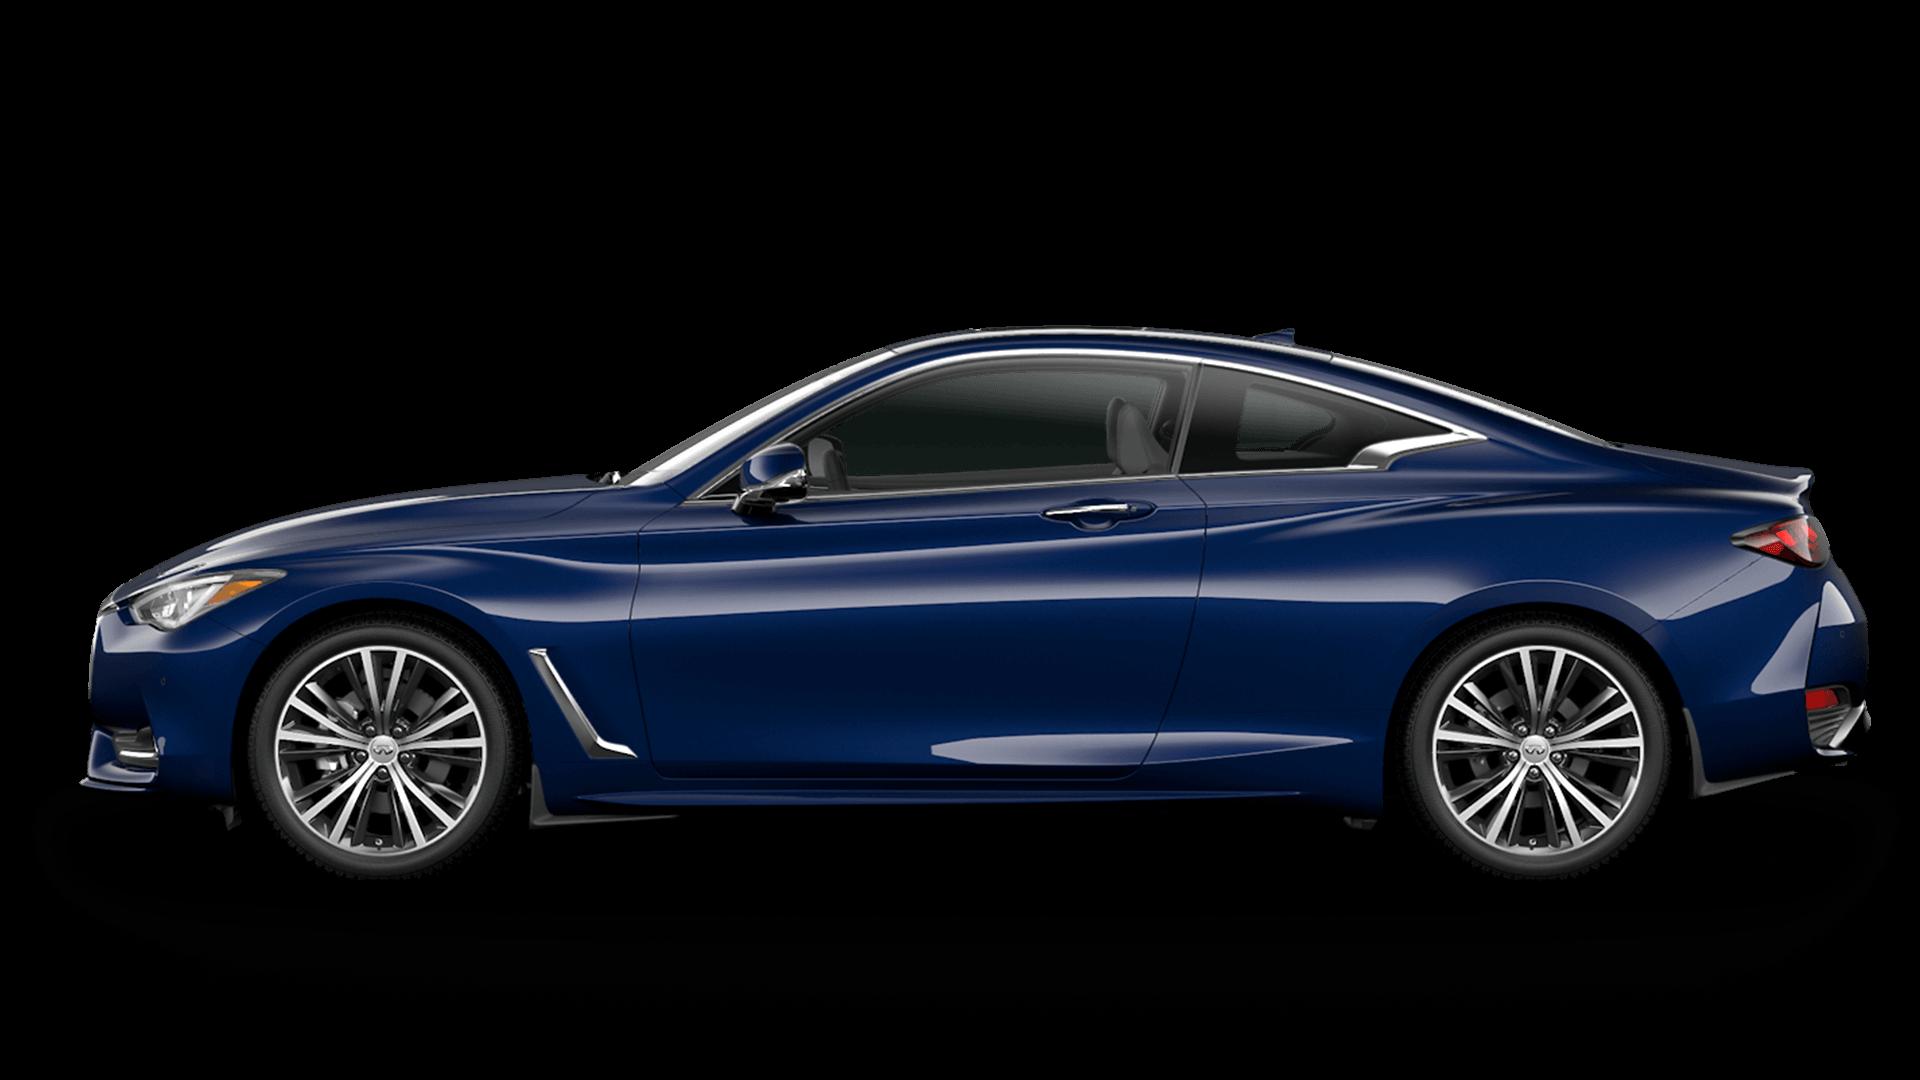 New 2021 Infiniti Q60 Luxe RWD model for sale at Oxnard Infiniti dealership near Van Nuys, CA